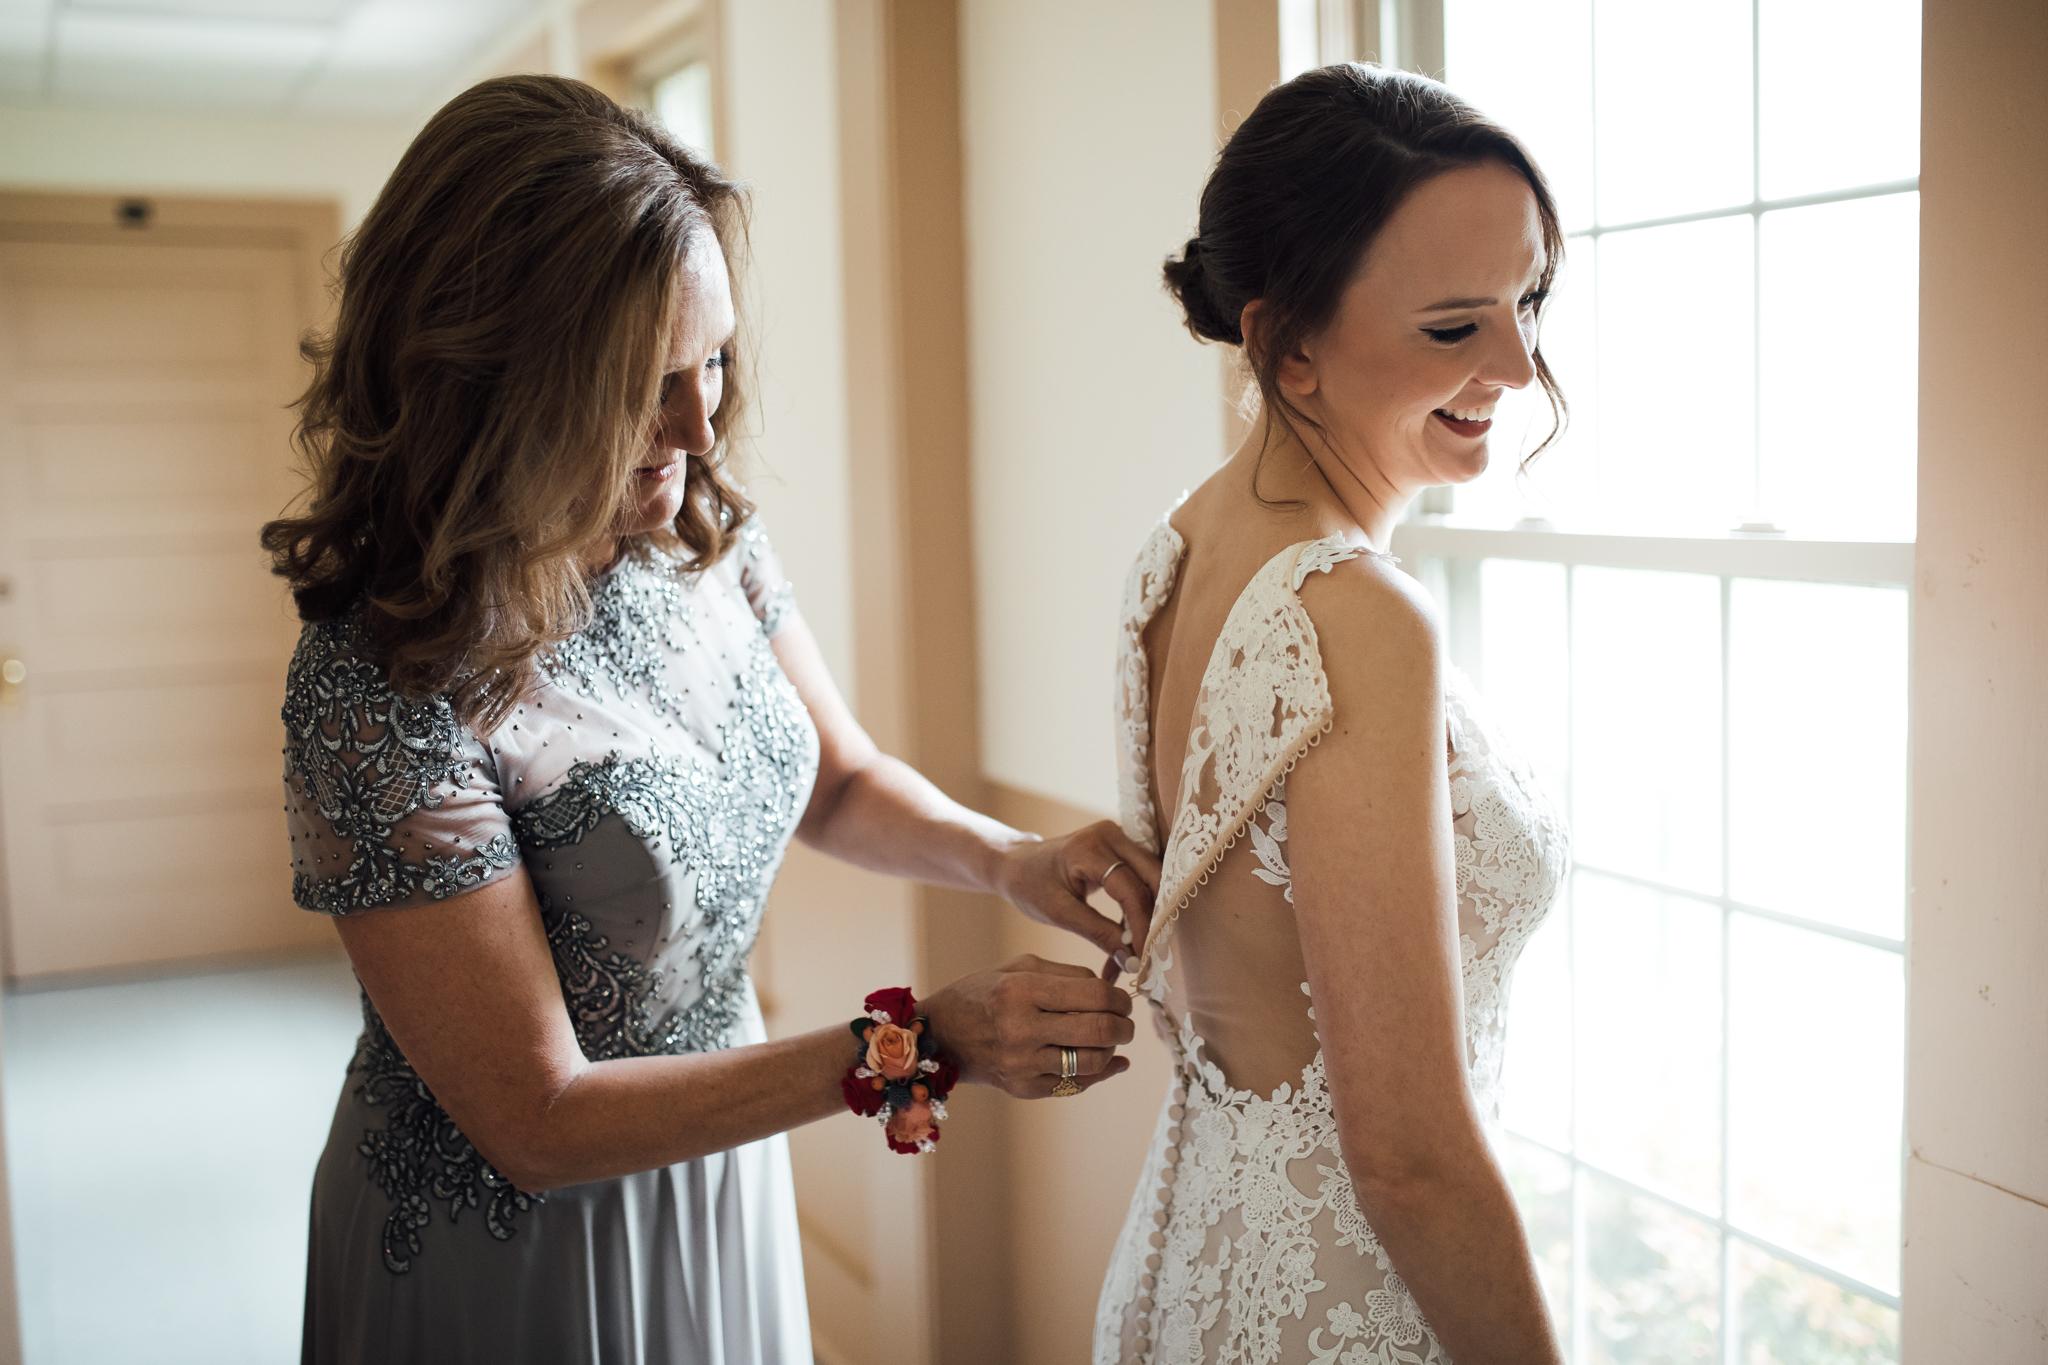 birmingham-alabama-wedding-photographer-laura-terry-the-warmth-around-you (27 of 110).jpg